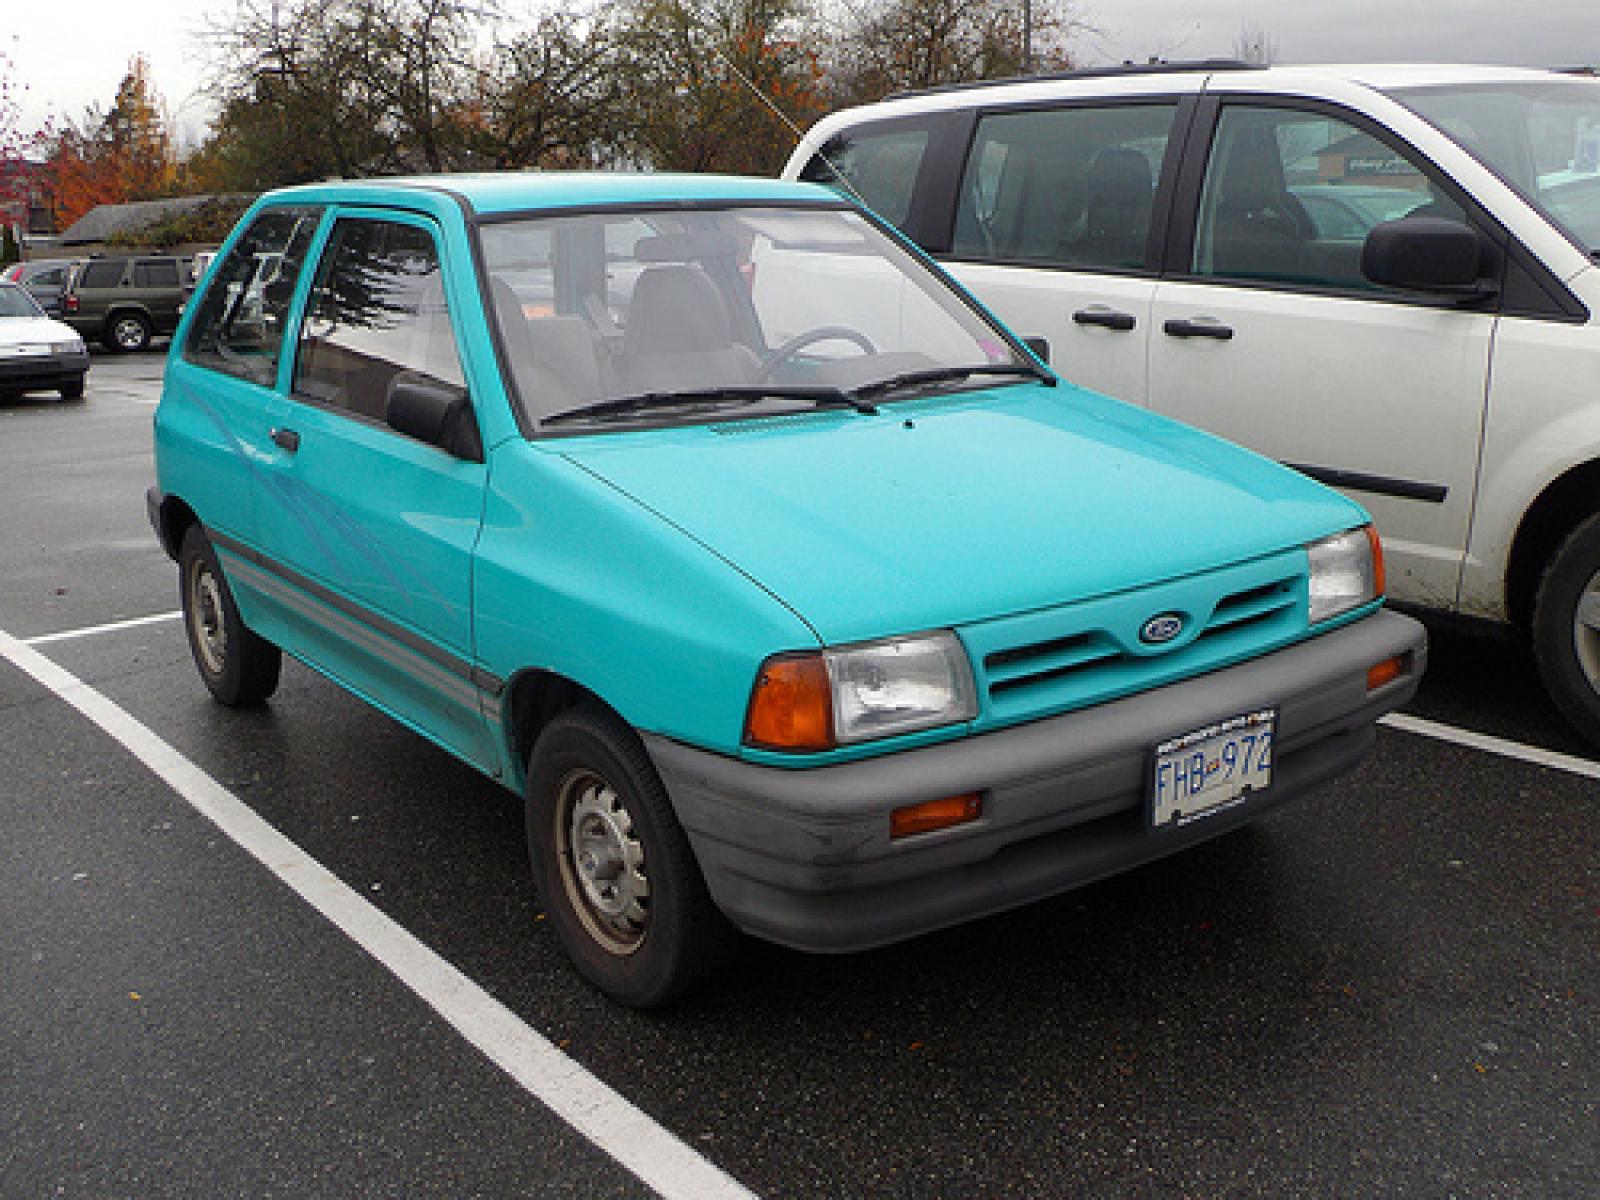 800 1024 1280 1600 origin 1993 ford festiva